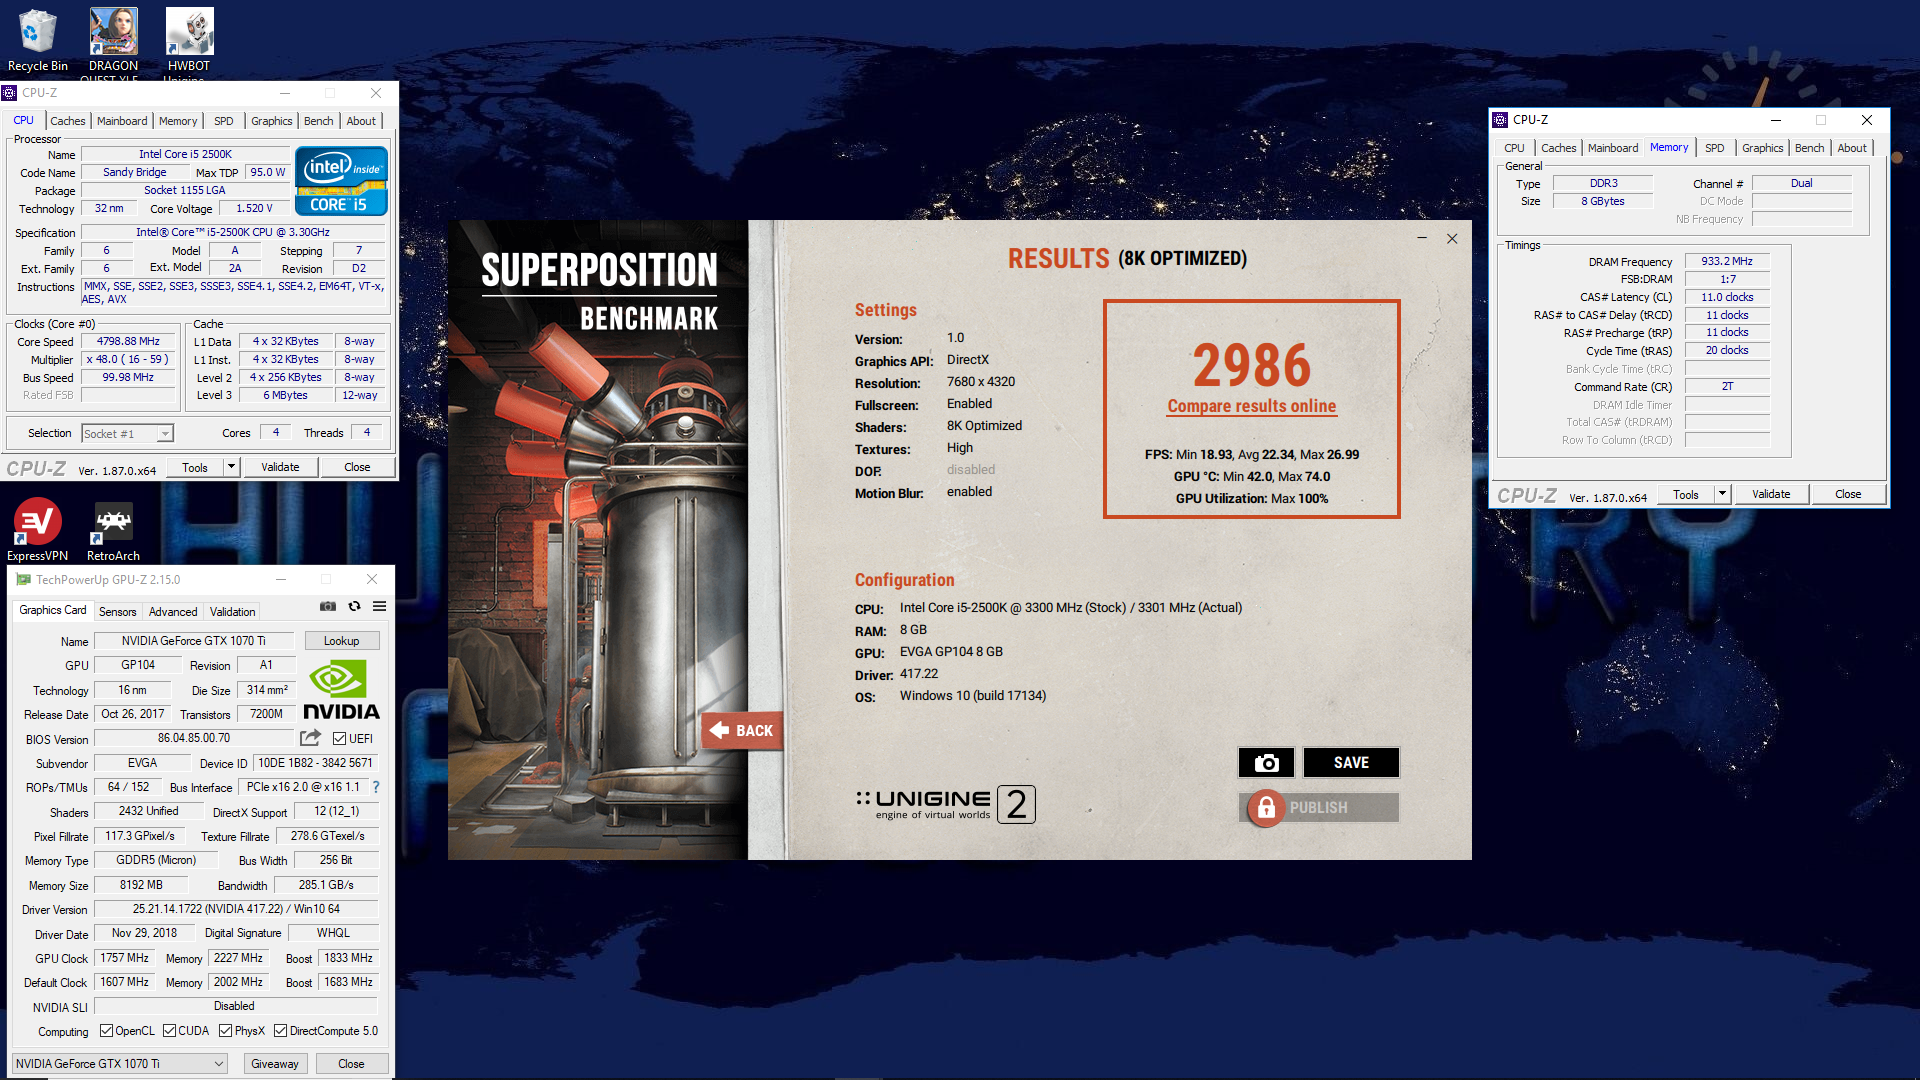 SupraFTW`s Unigine Superposition - 8K Optimized score: 2986